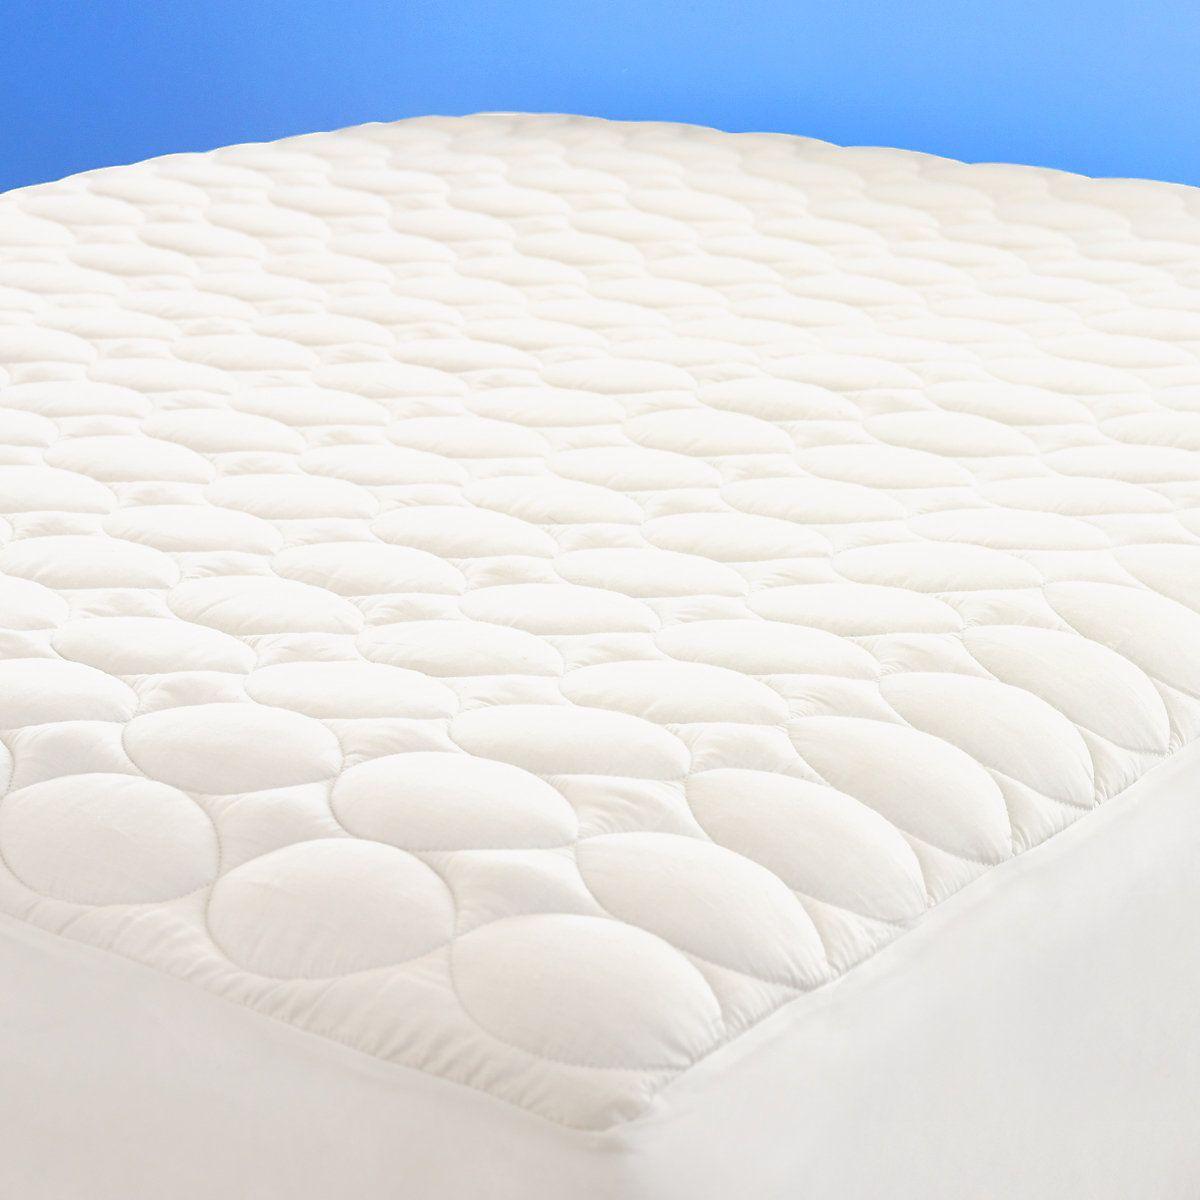 Cloud Mattress Pad Pine Cone Hill Mattress Mattress Pad Ivory Bedding